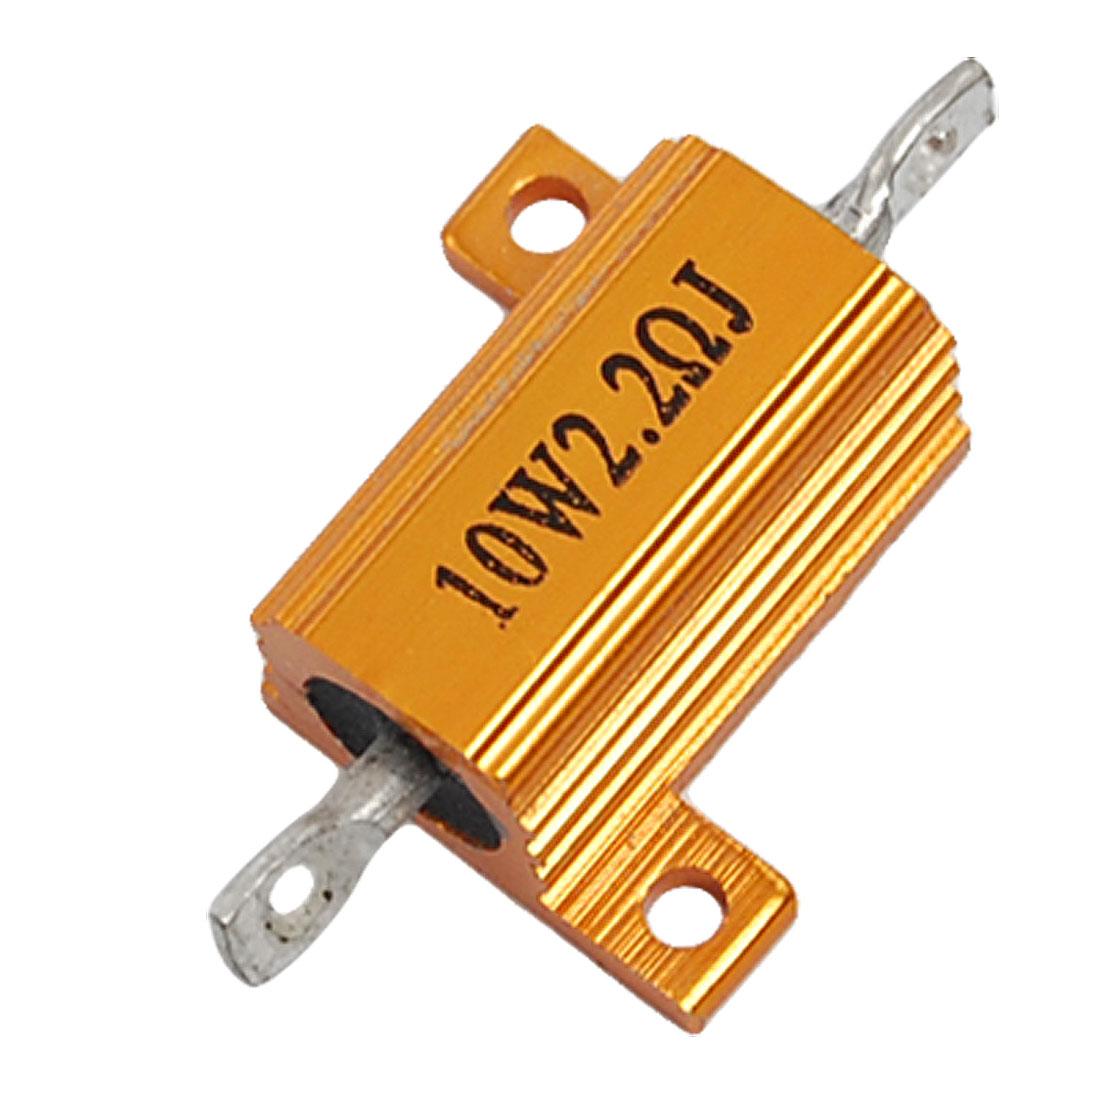 10W 2.2 Ohm 5% Aluminum Wire Wound Resistor Gold Tone